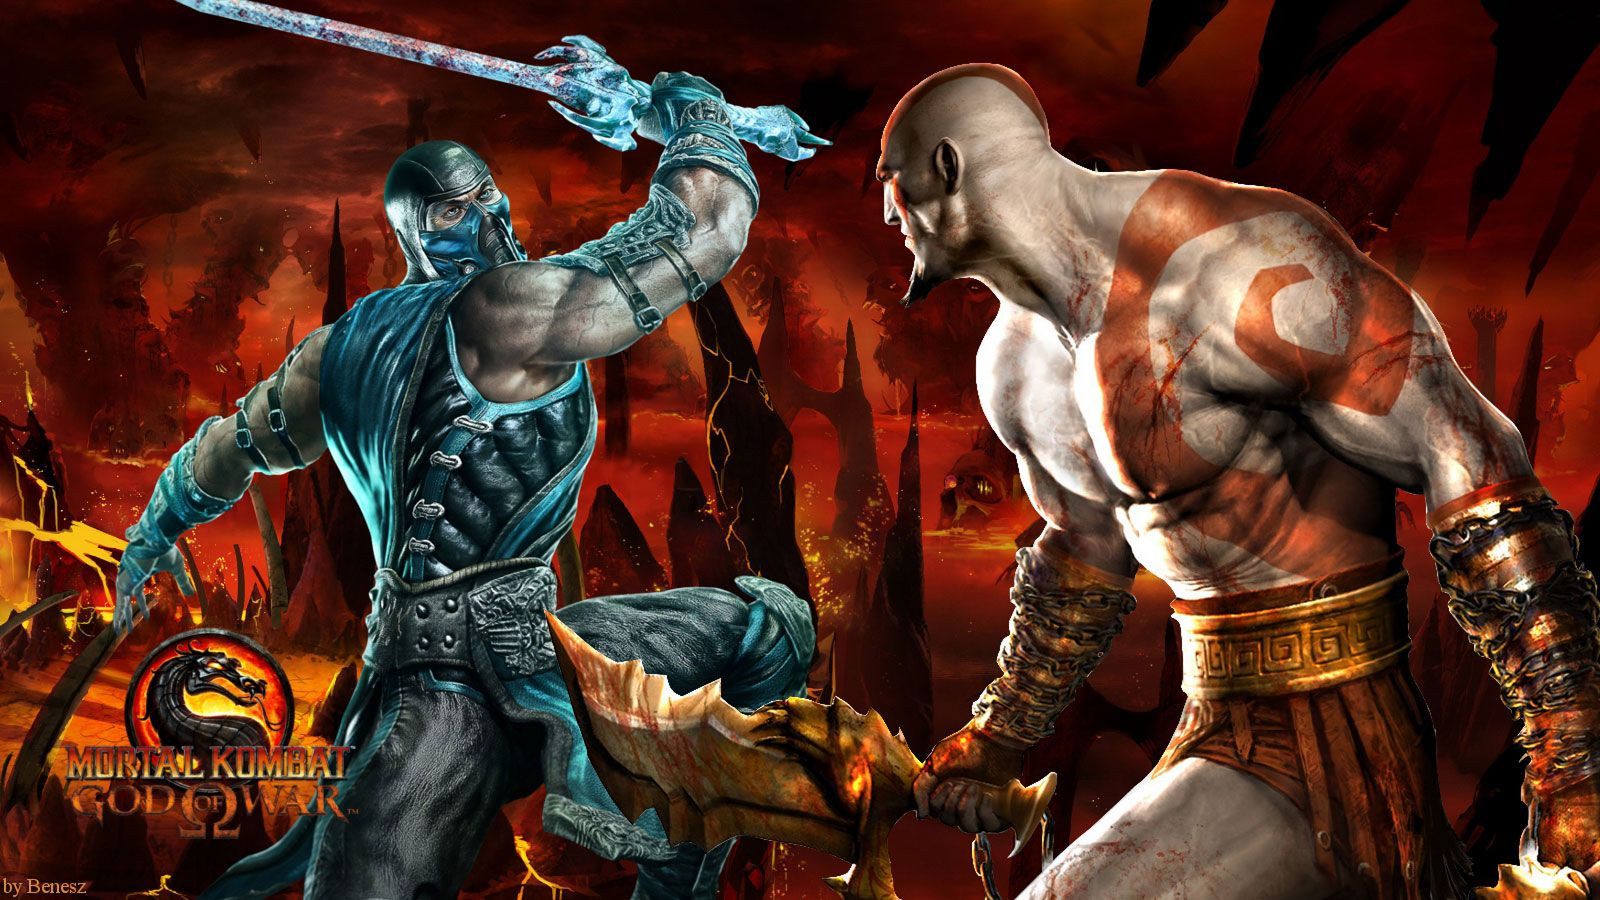 Mortal Kombat - Sub Zero vs Kratos | Video Game Characters | Mortal